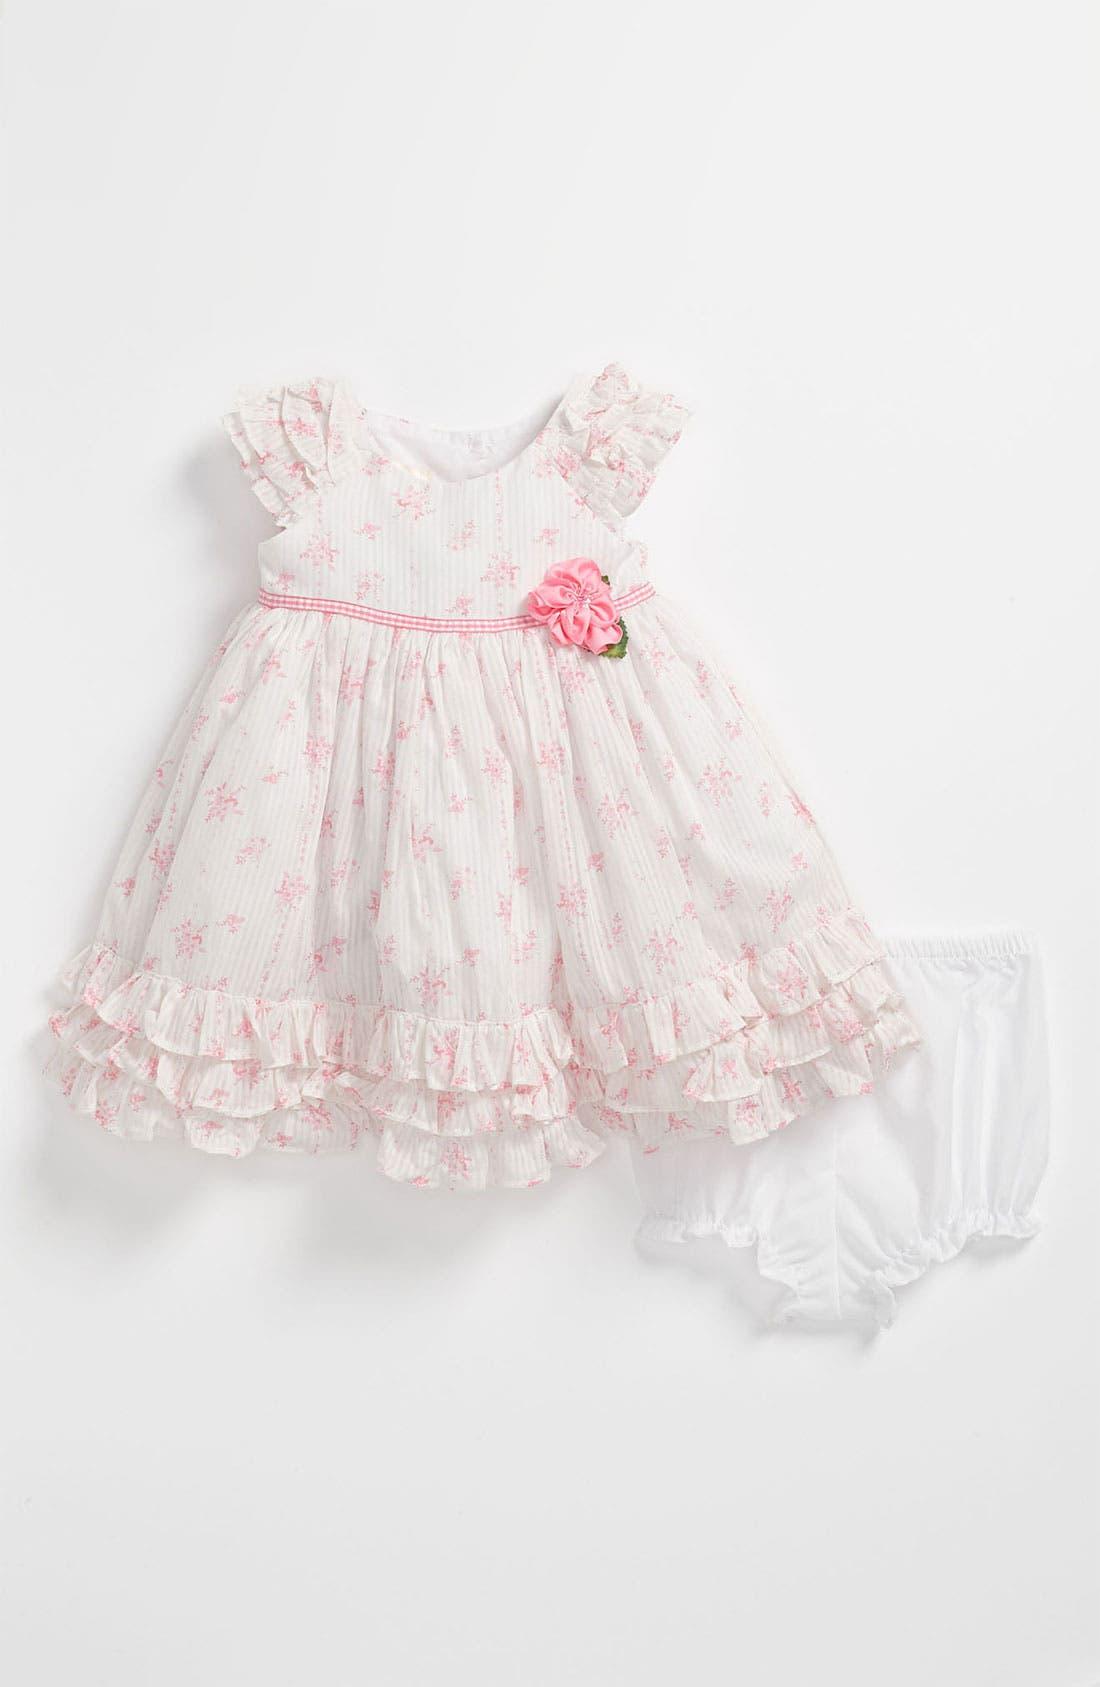 Alternate Image 1 Selected - Laura Ashley Wallpaper Print Dress & Bloomers (Infant)